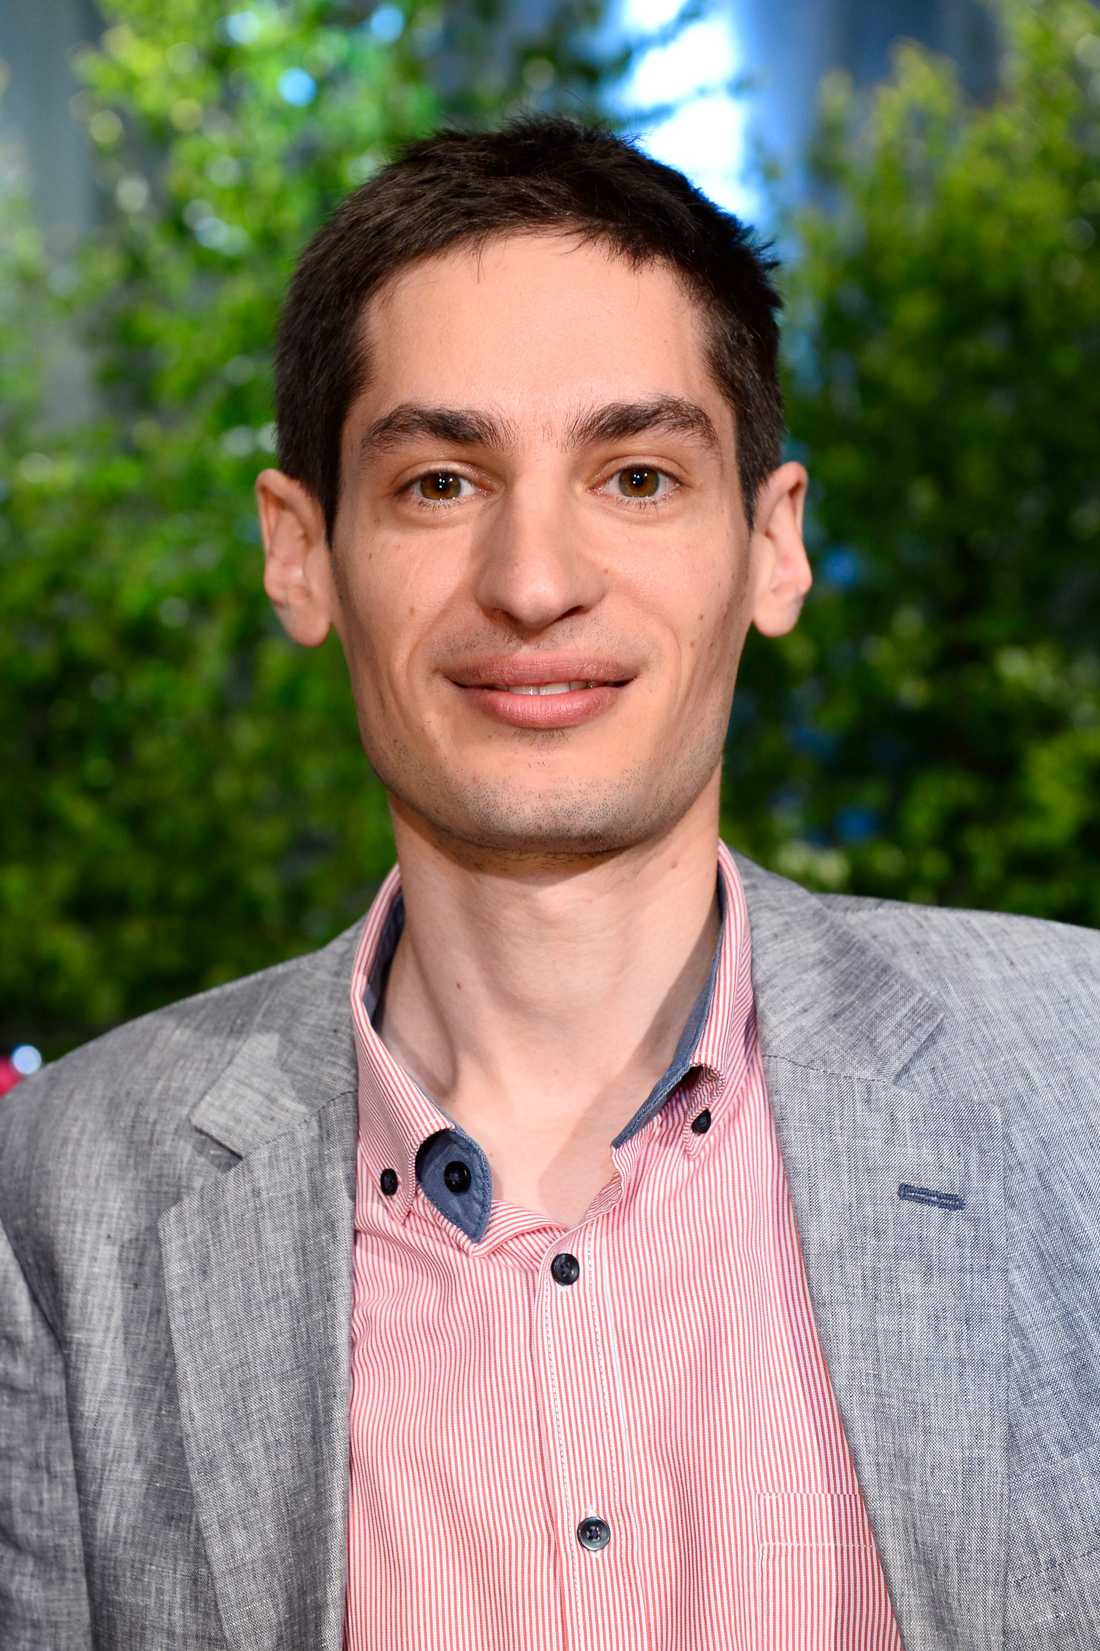 Peter Wolodarski, chefredaktör på DN.